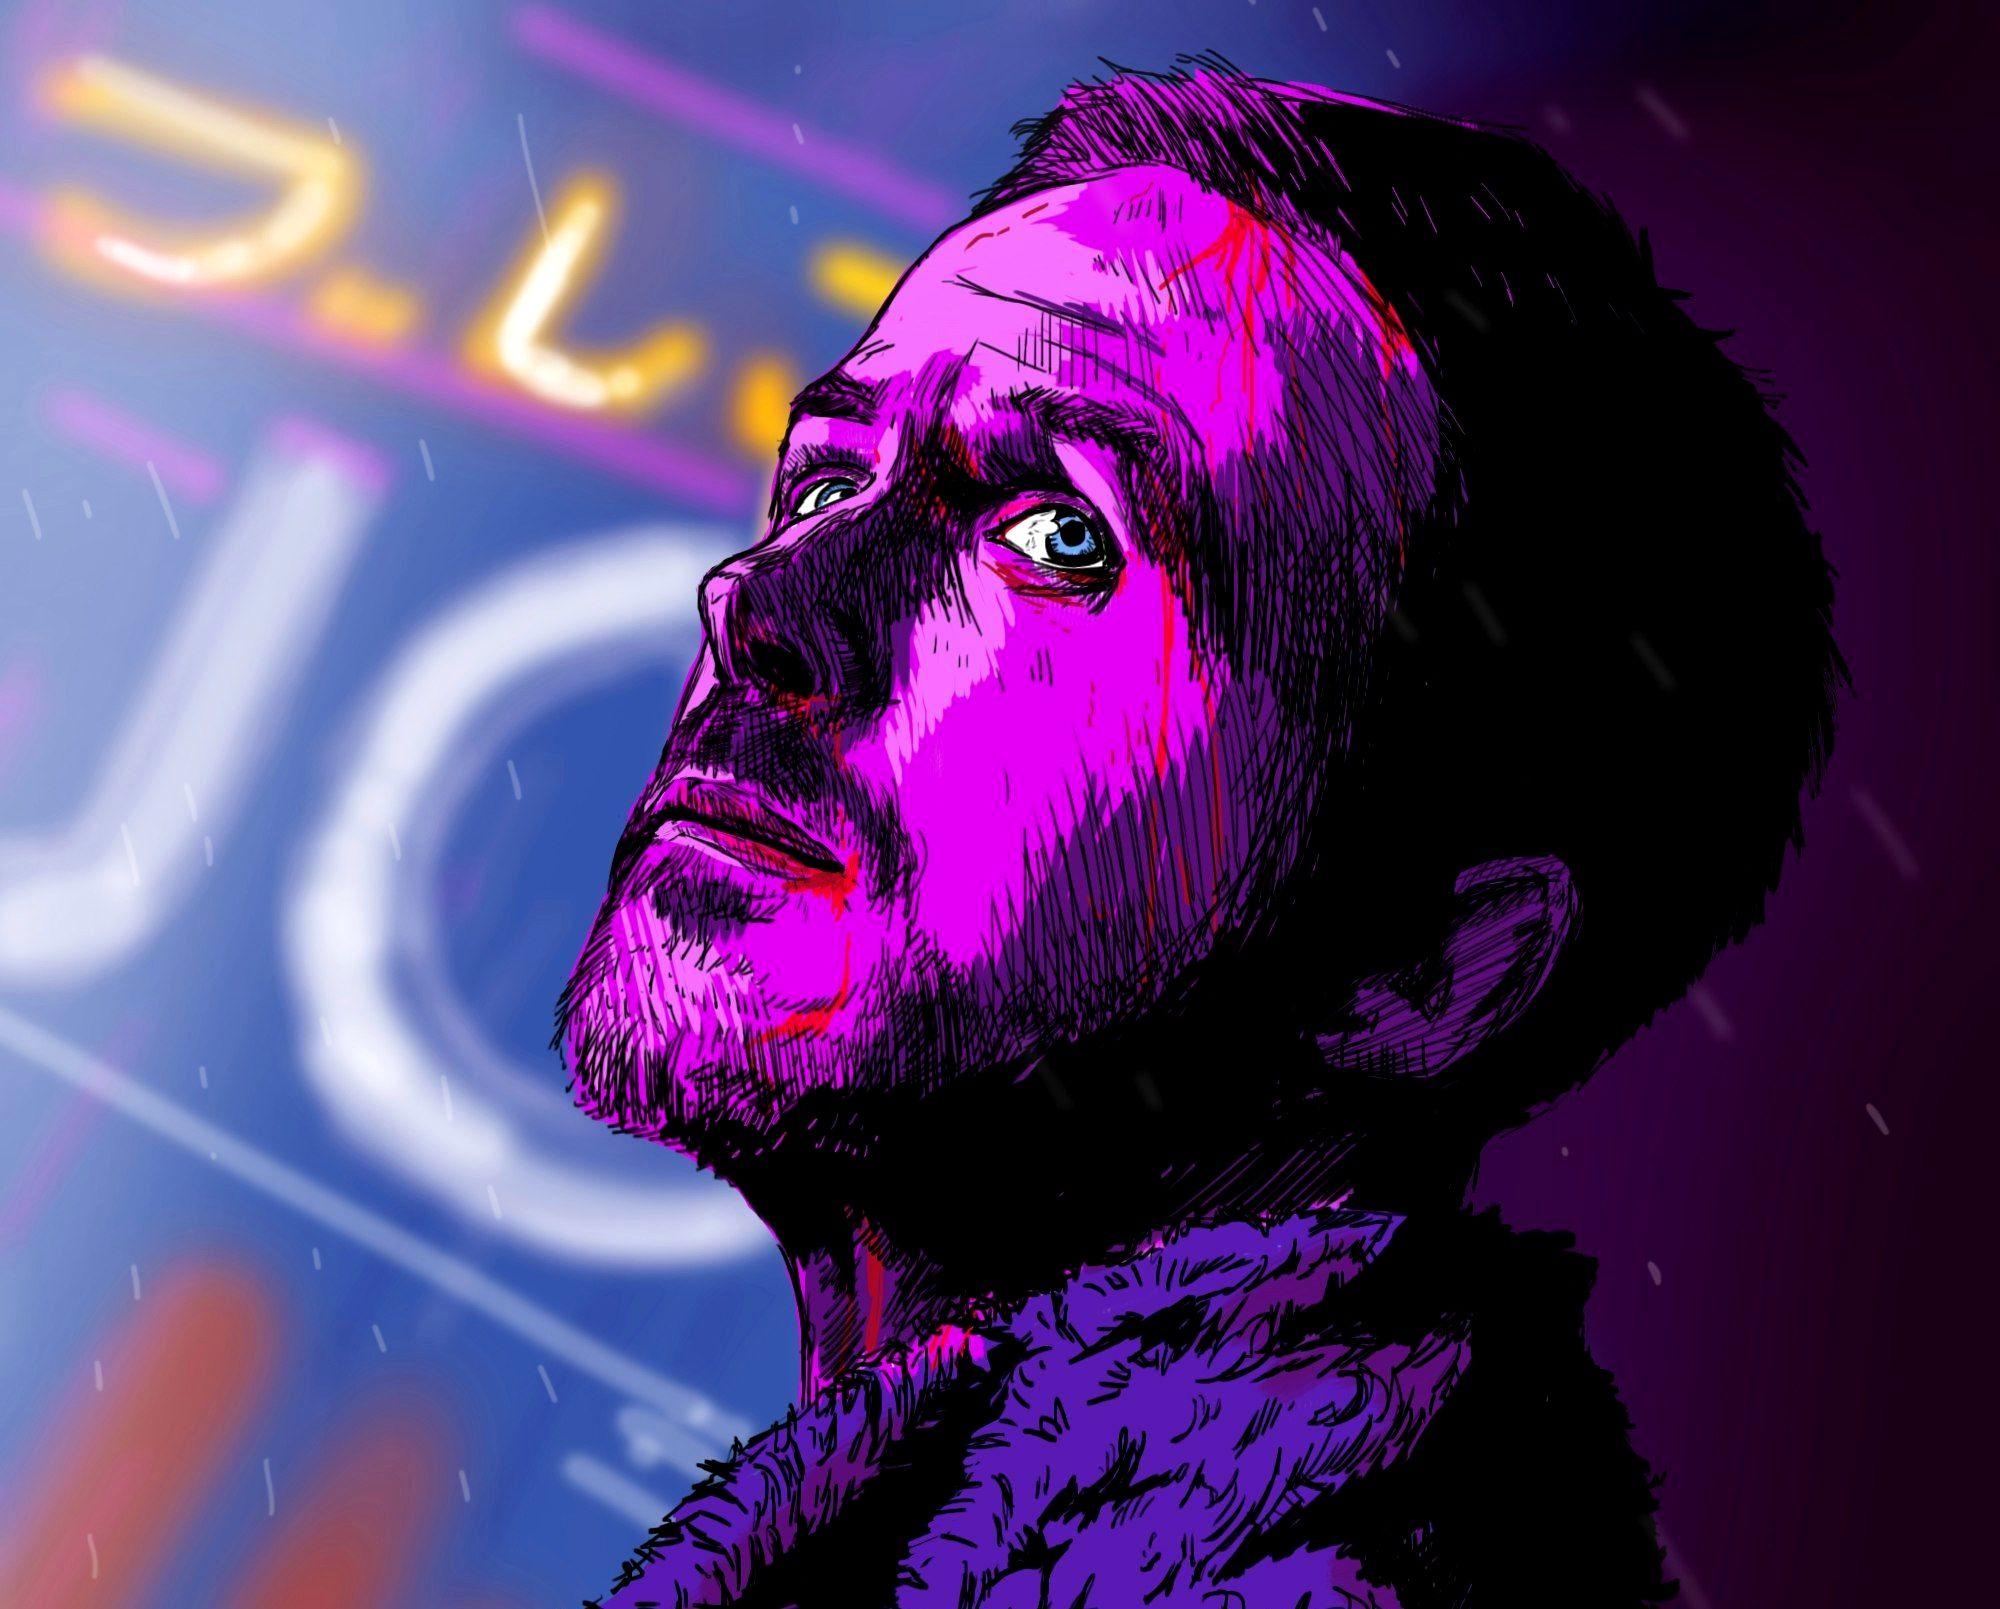 Blade Runner 4k Wallpaper Reddit Ideas In 2020 With Images